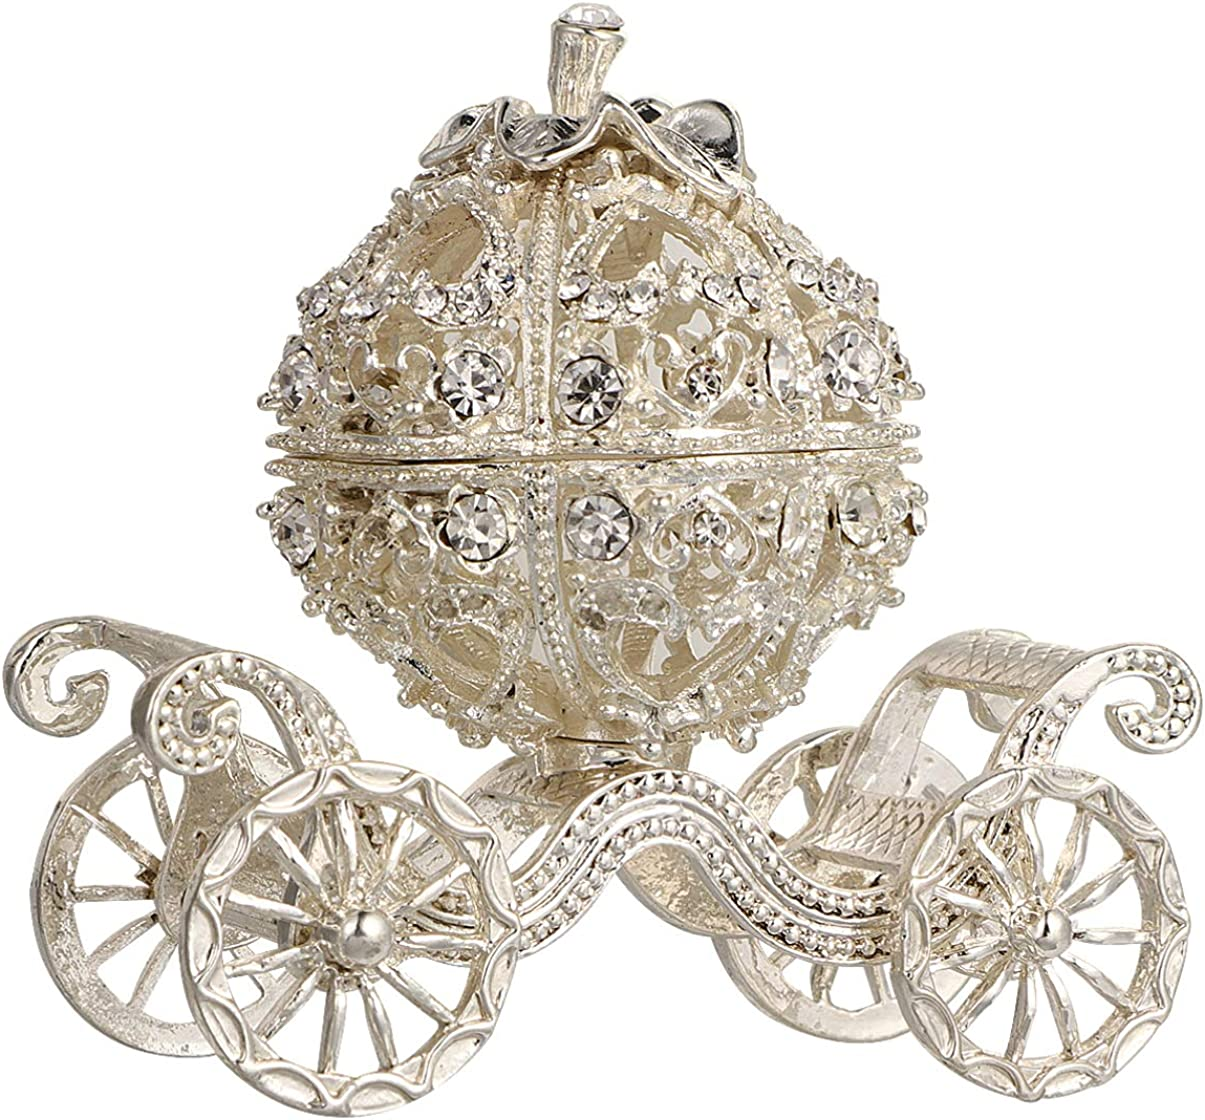 Kisangel Silver Rhinestone Princess Crystal Pumpkin Carriage Trinket Jewelry Box Collectible Figurine Decorative Jewelry Ring Display Holder Table Sculpture